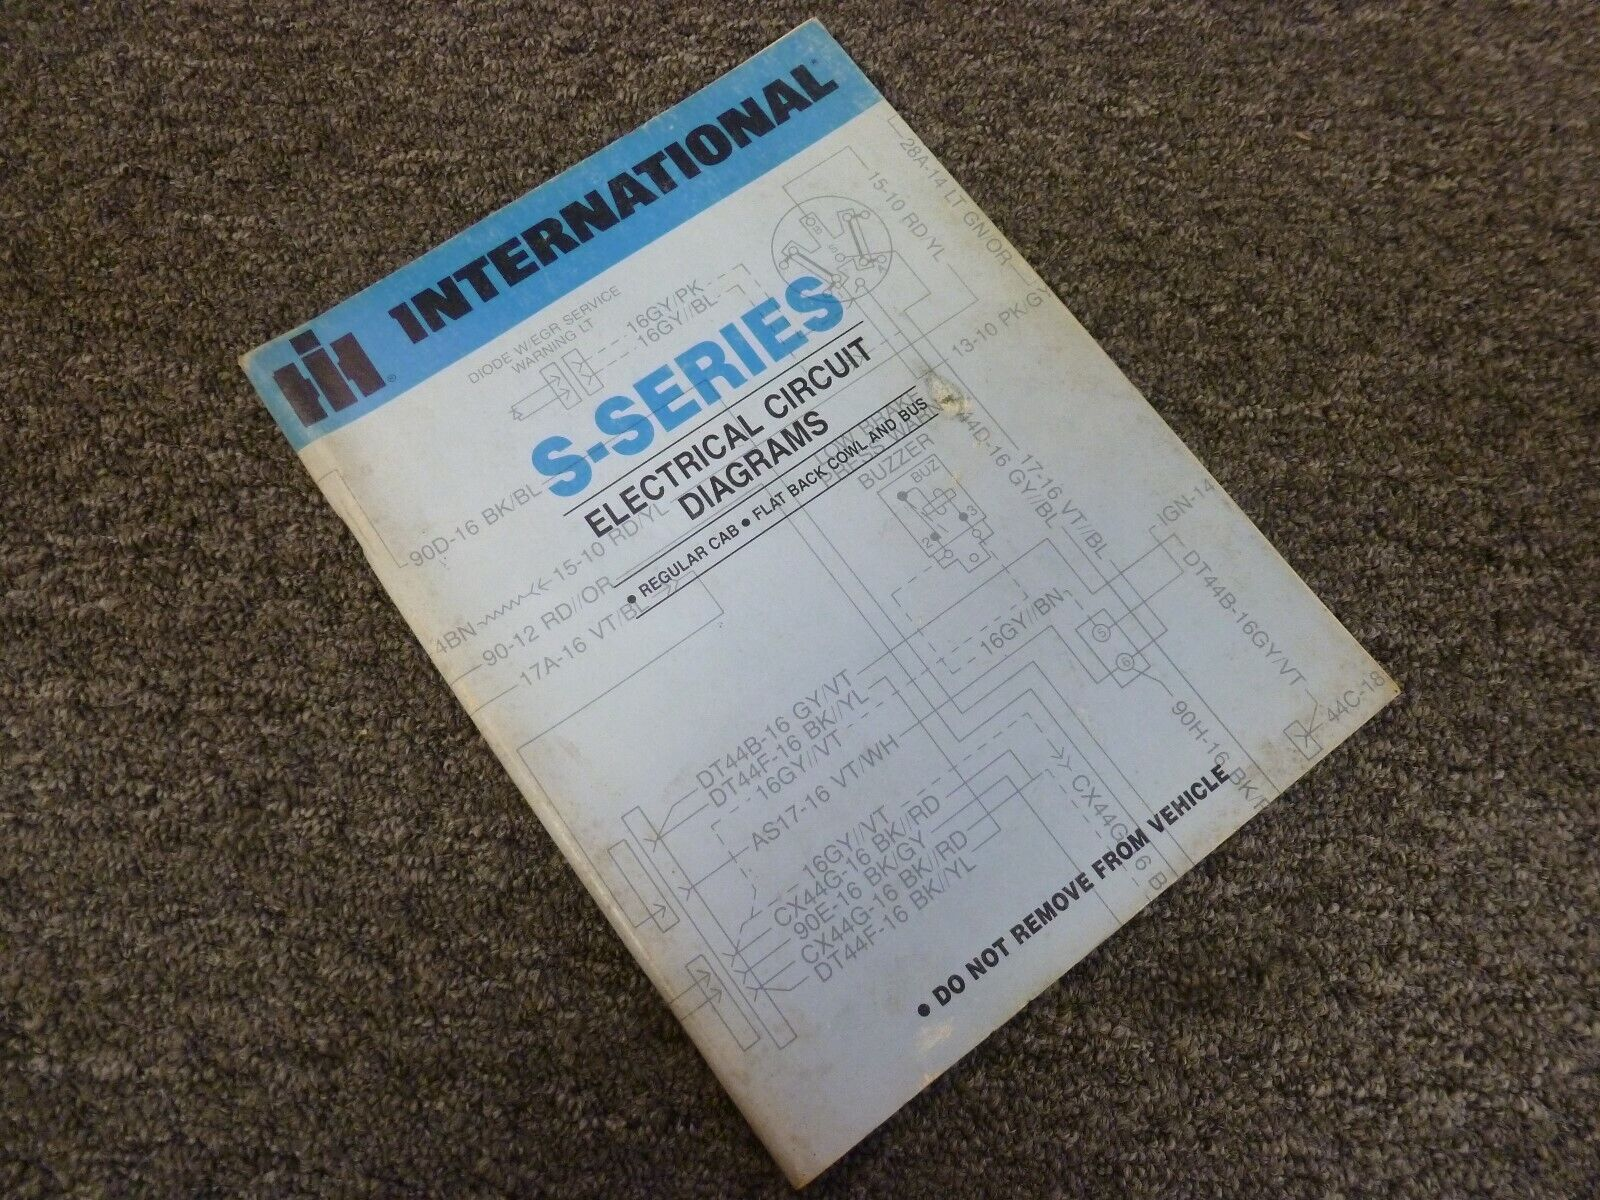 1981 international 2574 2575 2674 truck electrical wiring diagrams manual    ebay  ebay